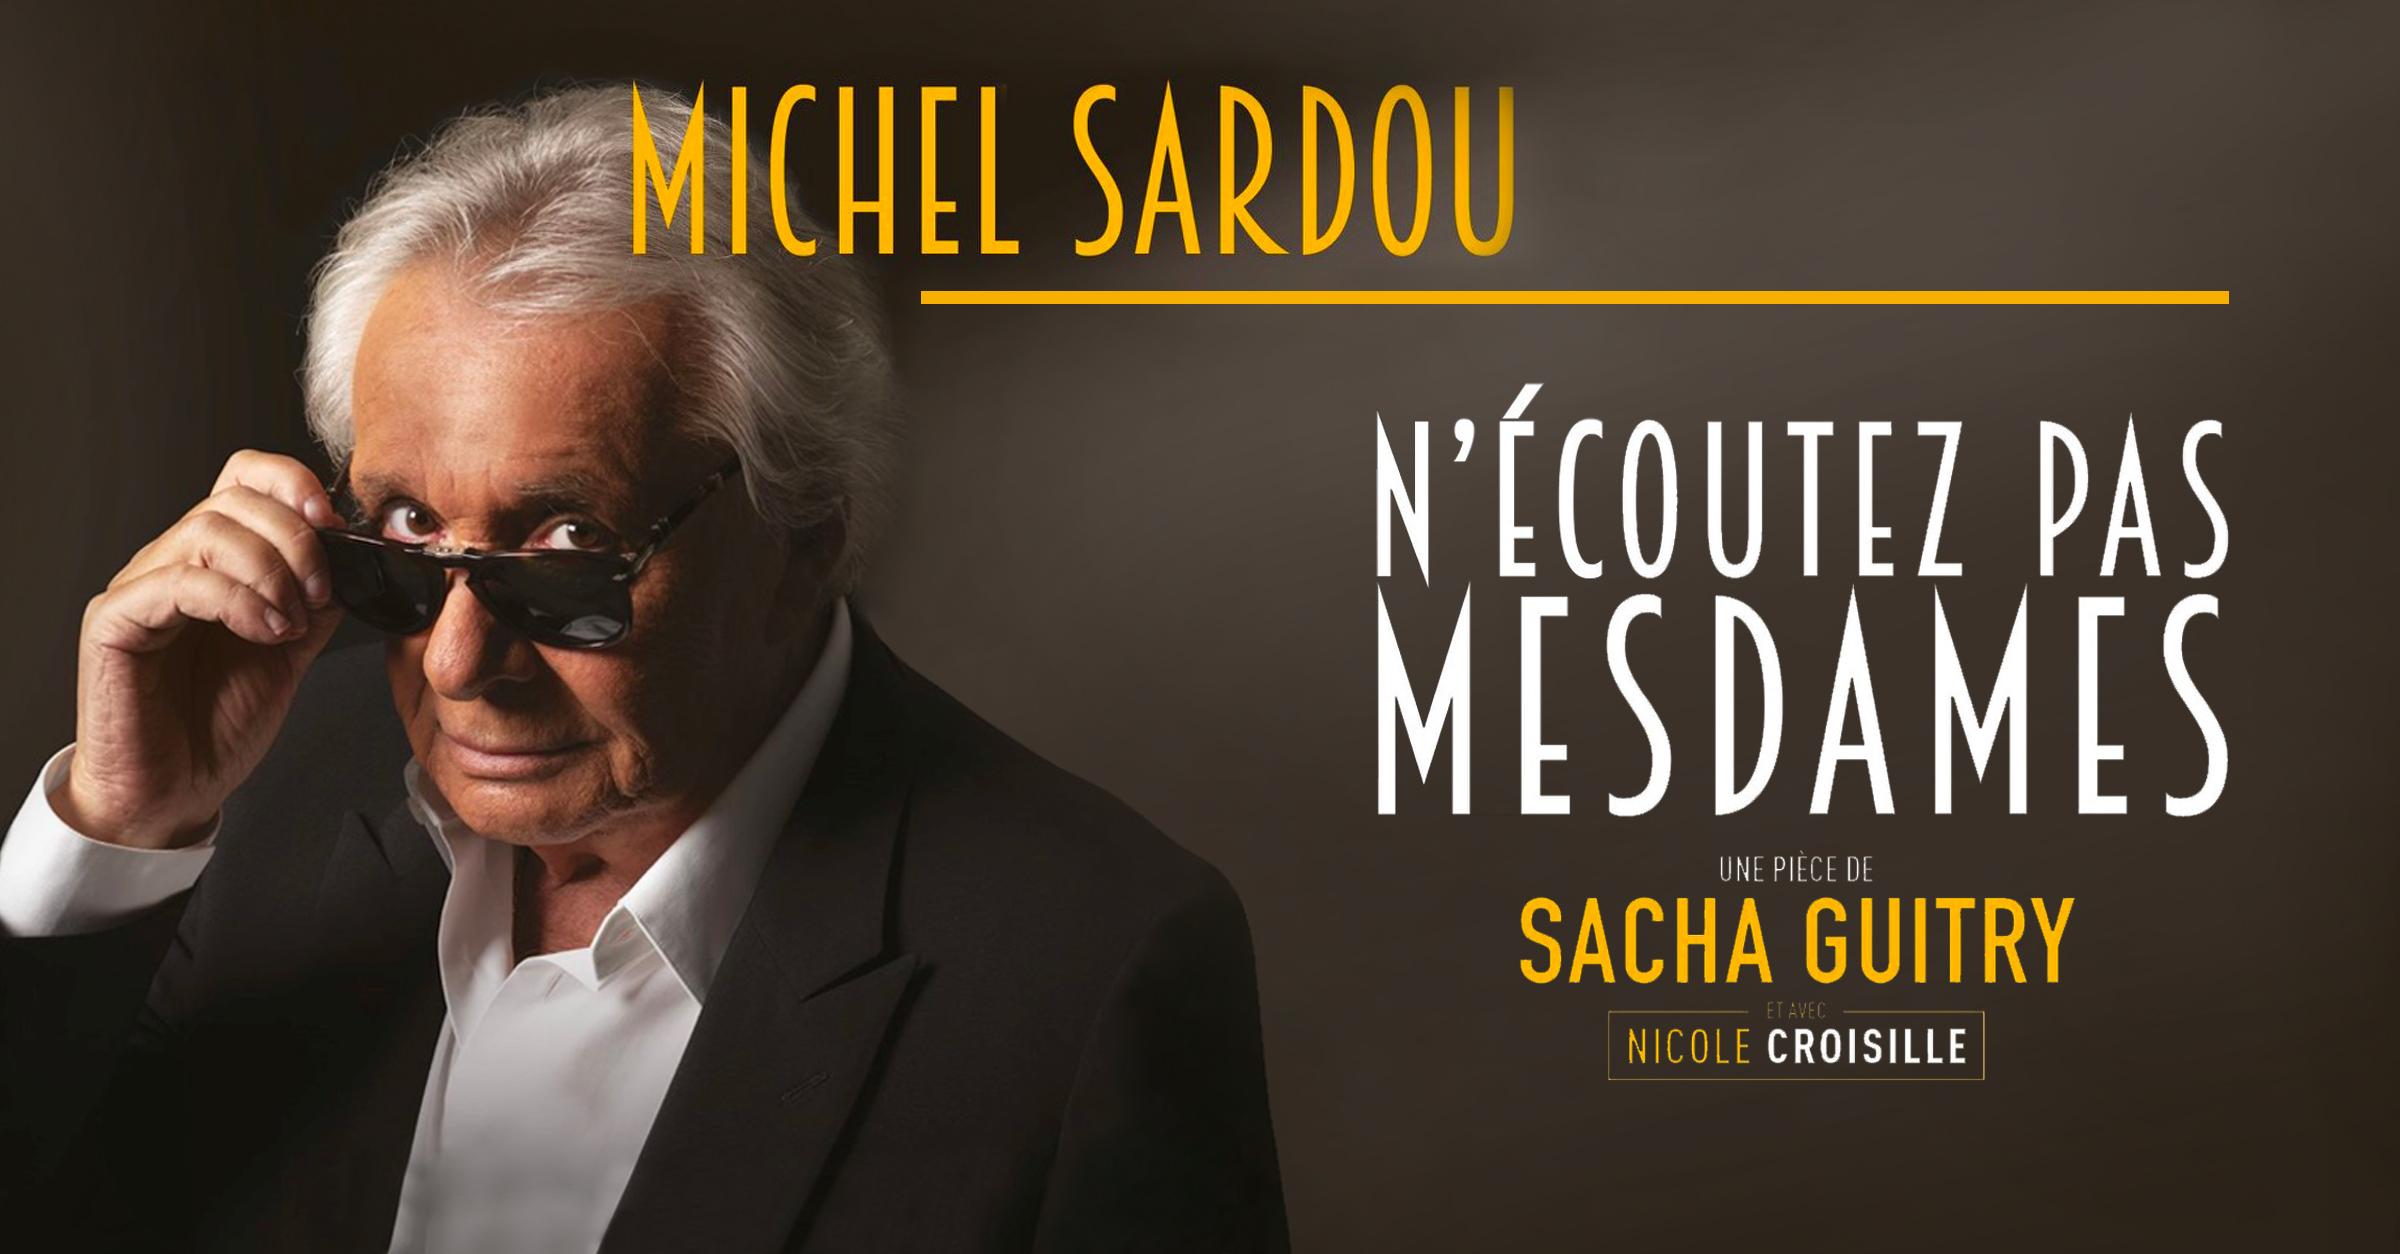 Michel Sardou en concert cover